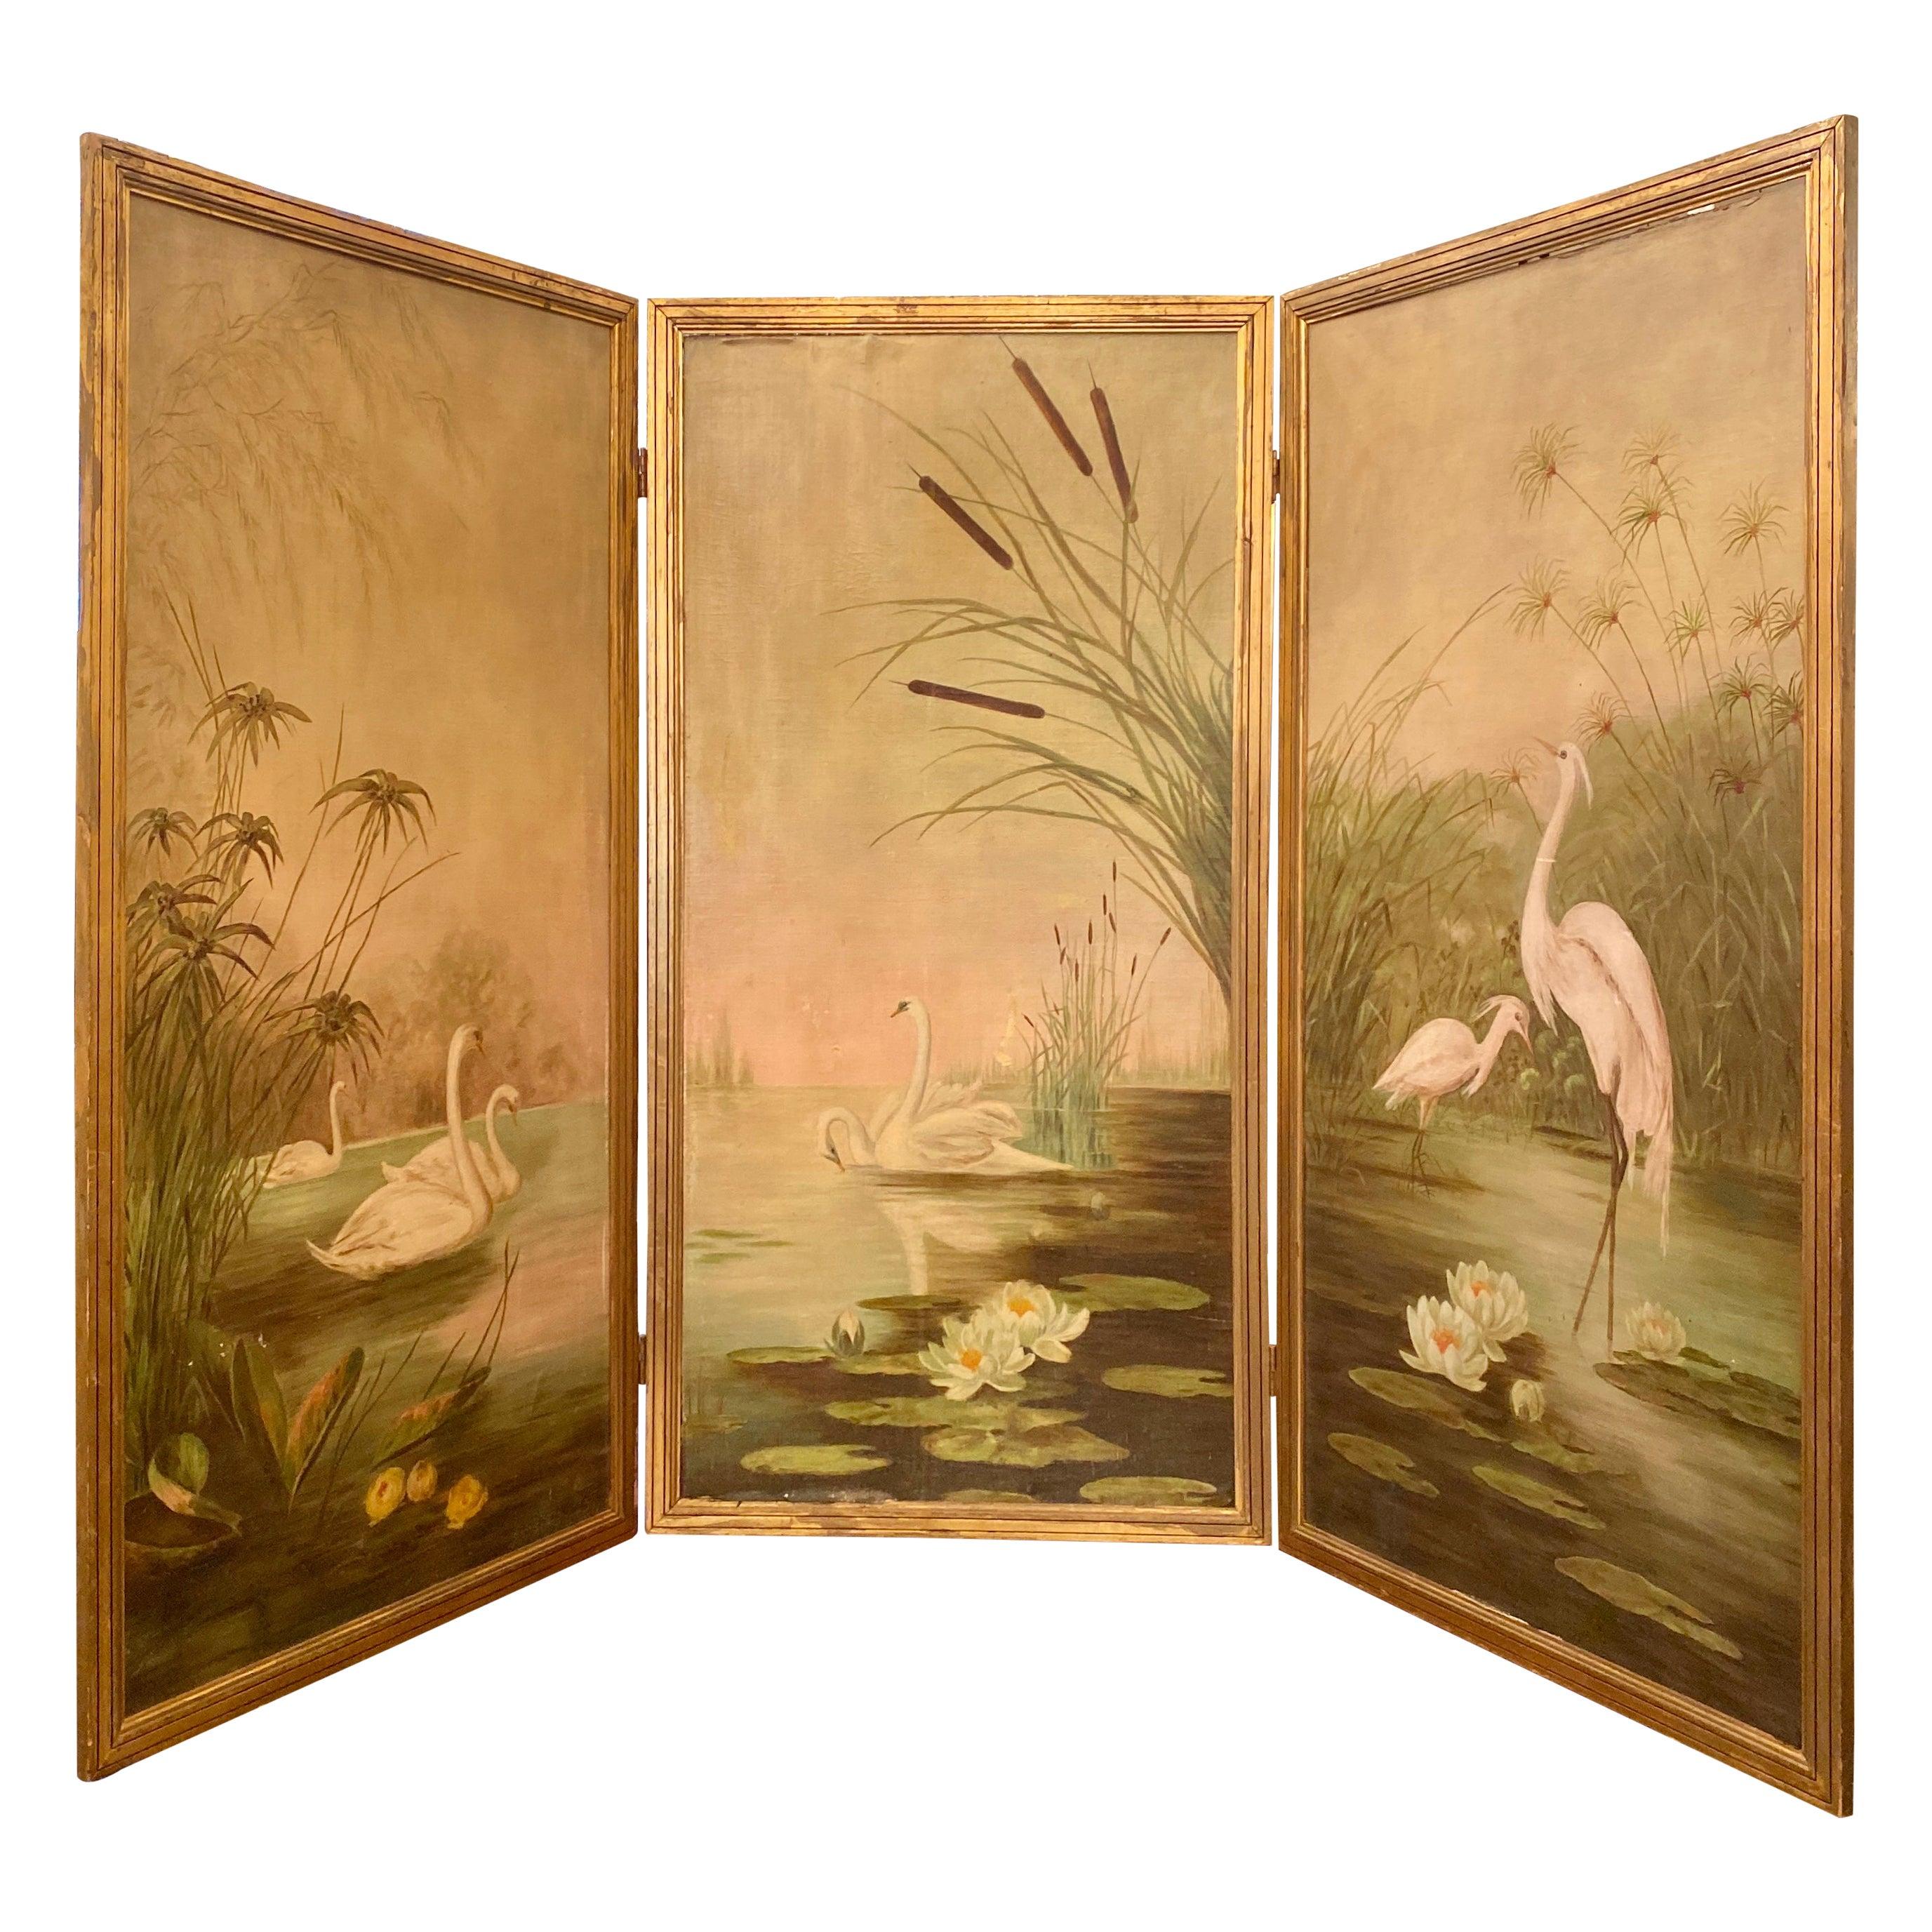 Estate Three Paneled Art Nouveau Painted Oil on Canvas Landscape Screen